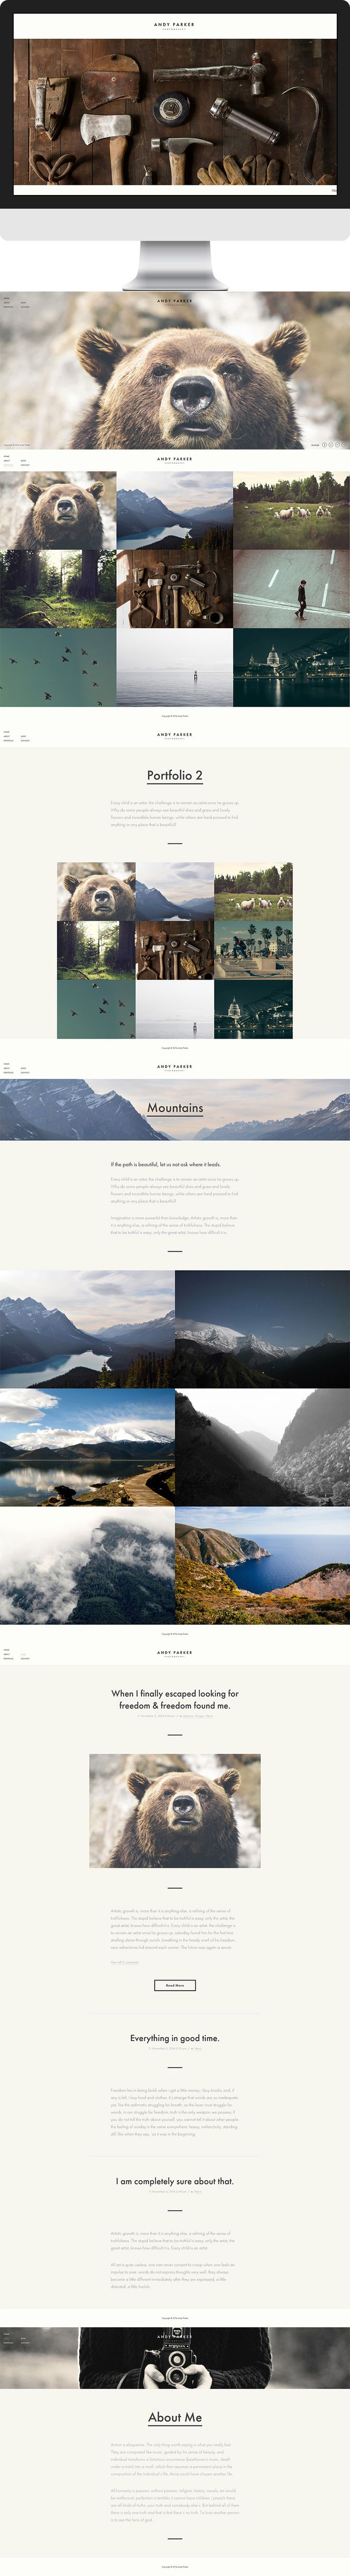 New minimal and stylish WordPress theme for photographers.